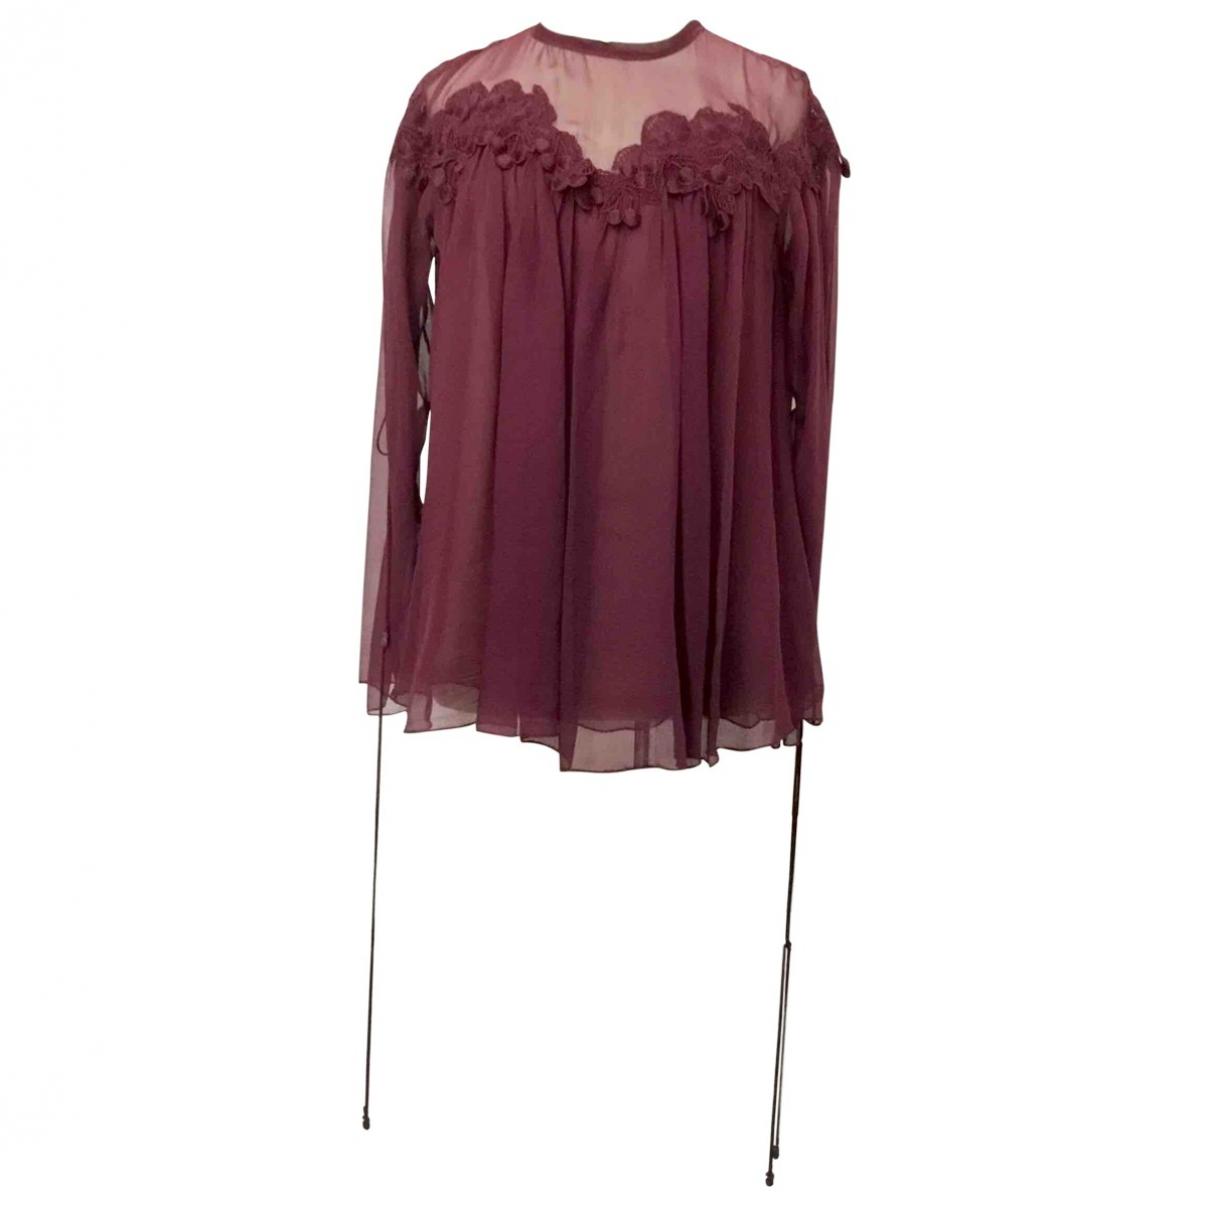 Chloé \N Burgundy Silk  top for Women 36 FR